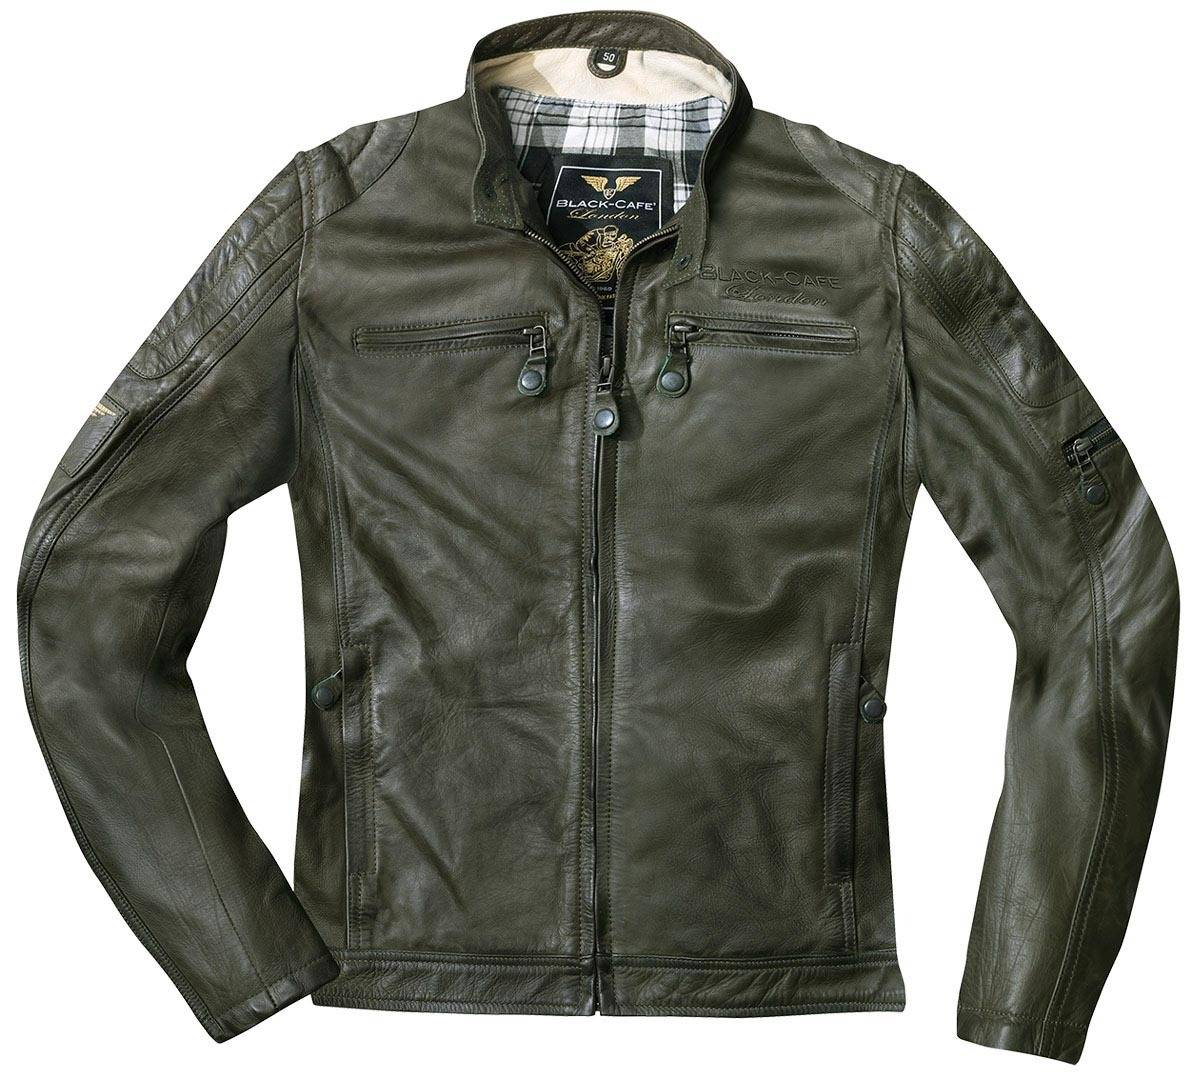 Black-Cafe London Schiras Veste en cuir de moto Vert taille : 52